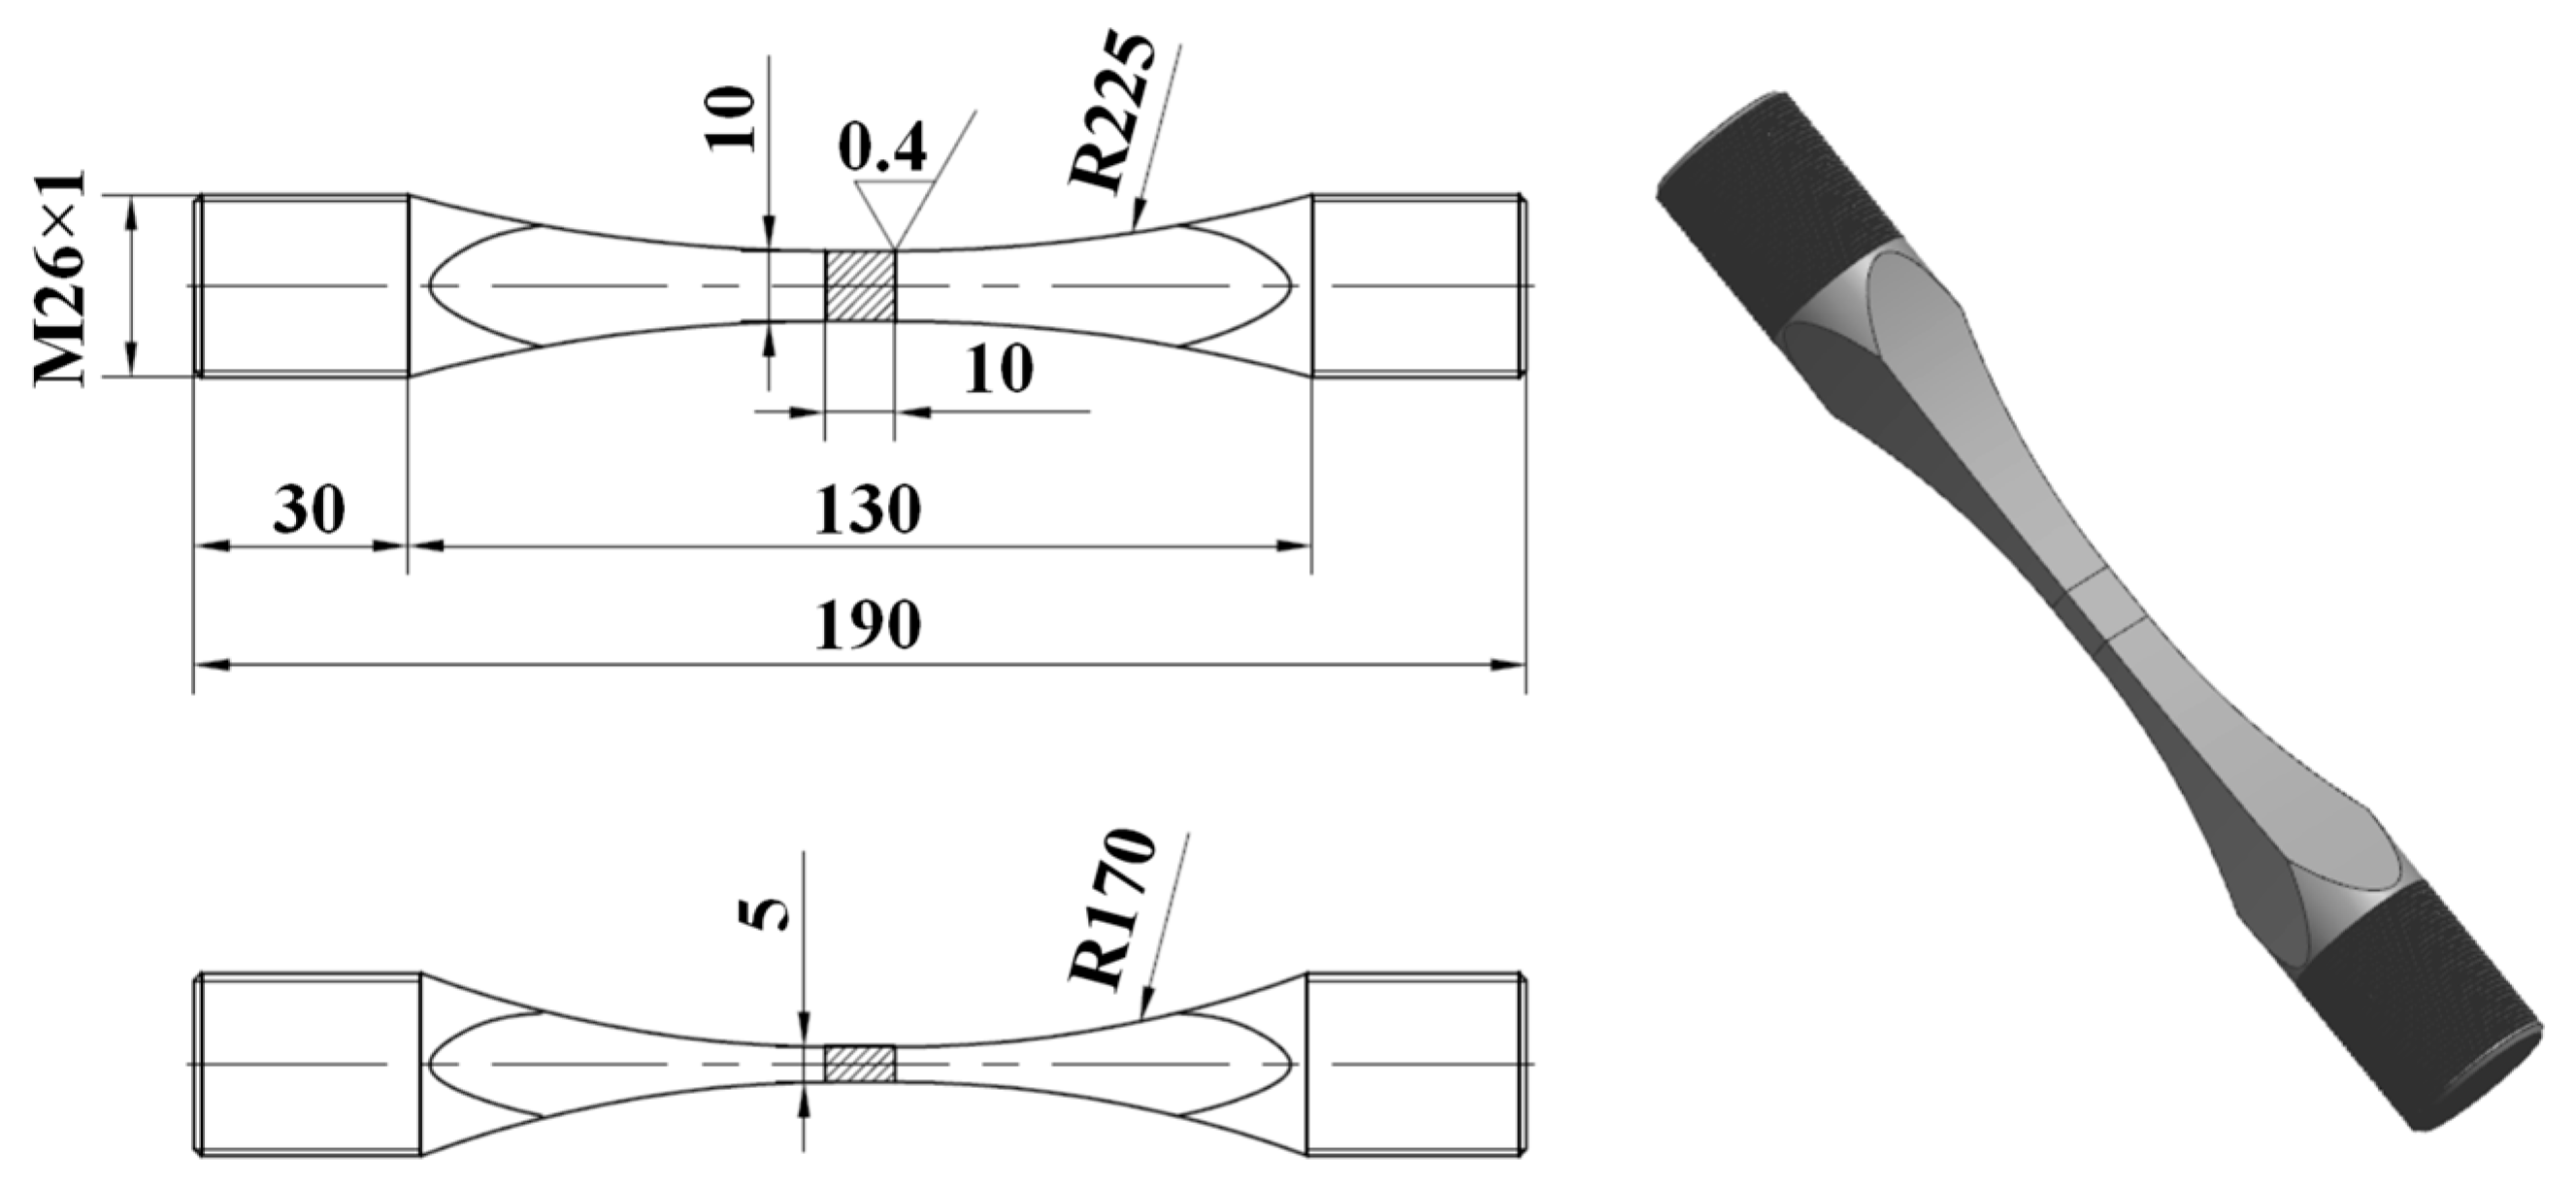 Metals Free Full Text Experimental Investigation On The Fatigue Thread Wj Vacuum Diagram 07 00158 G001